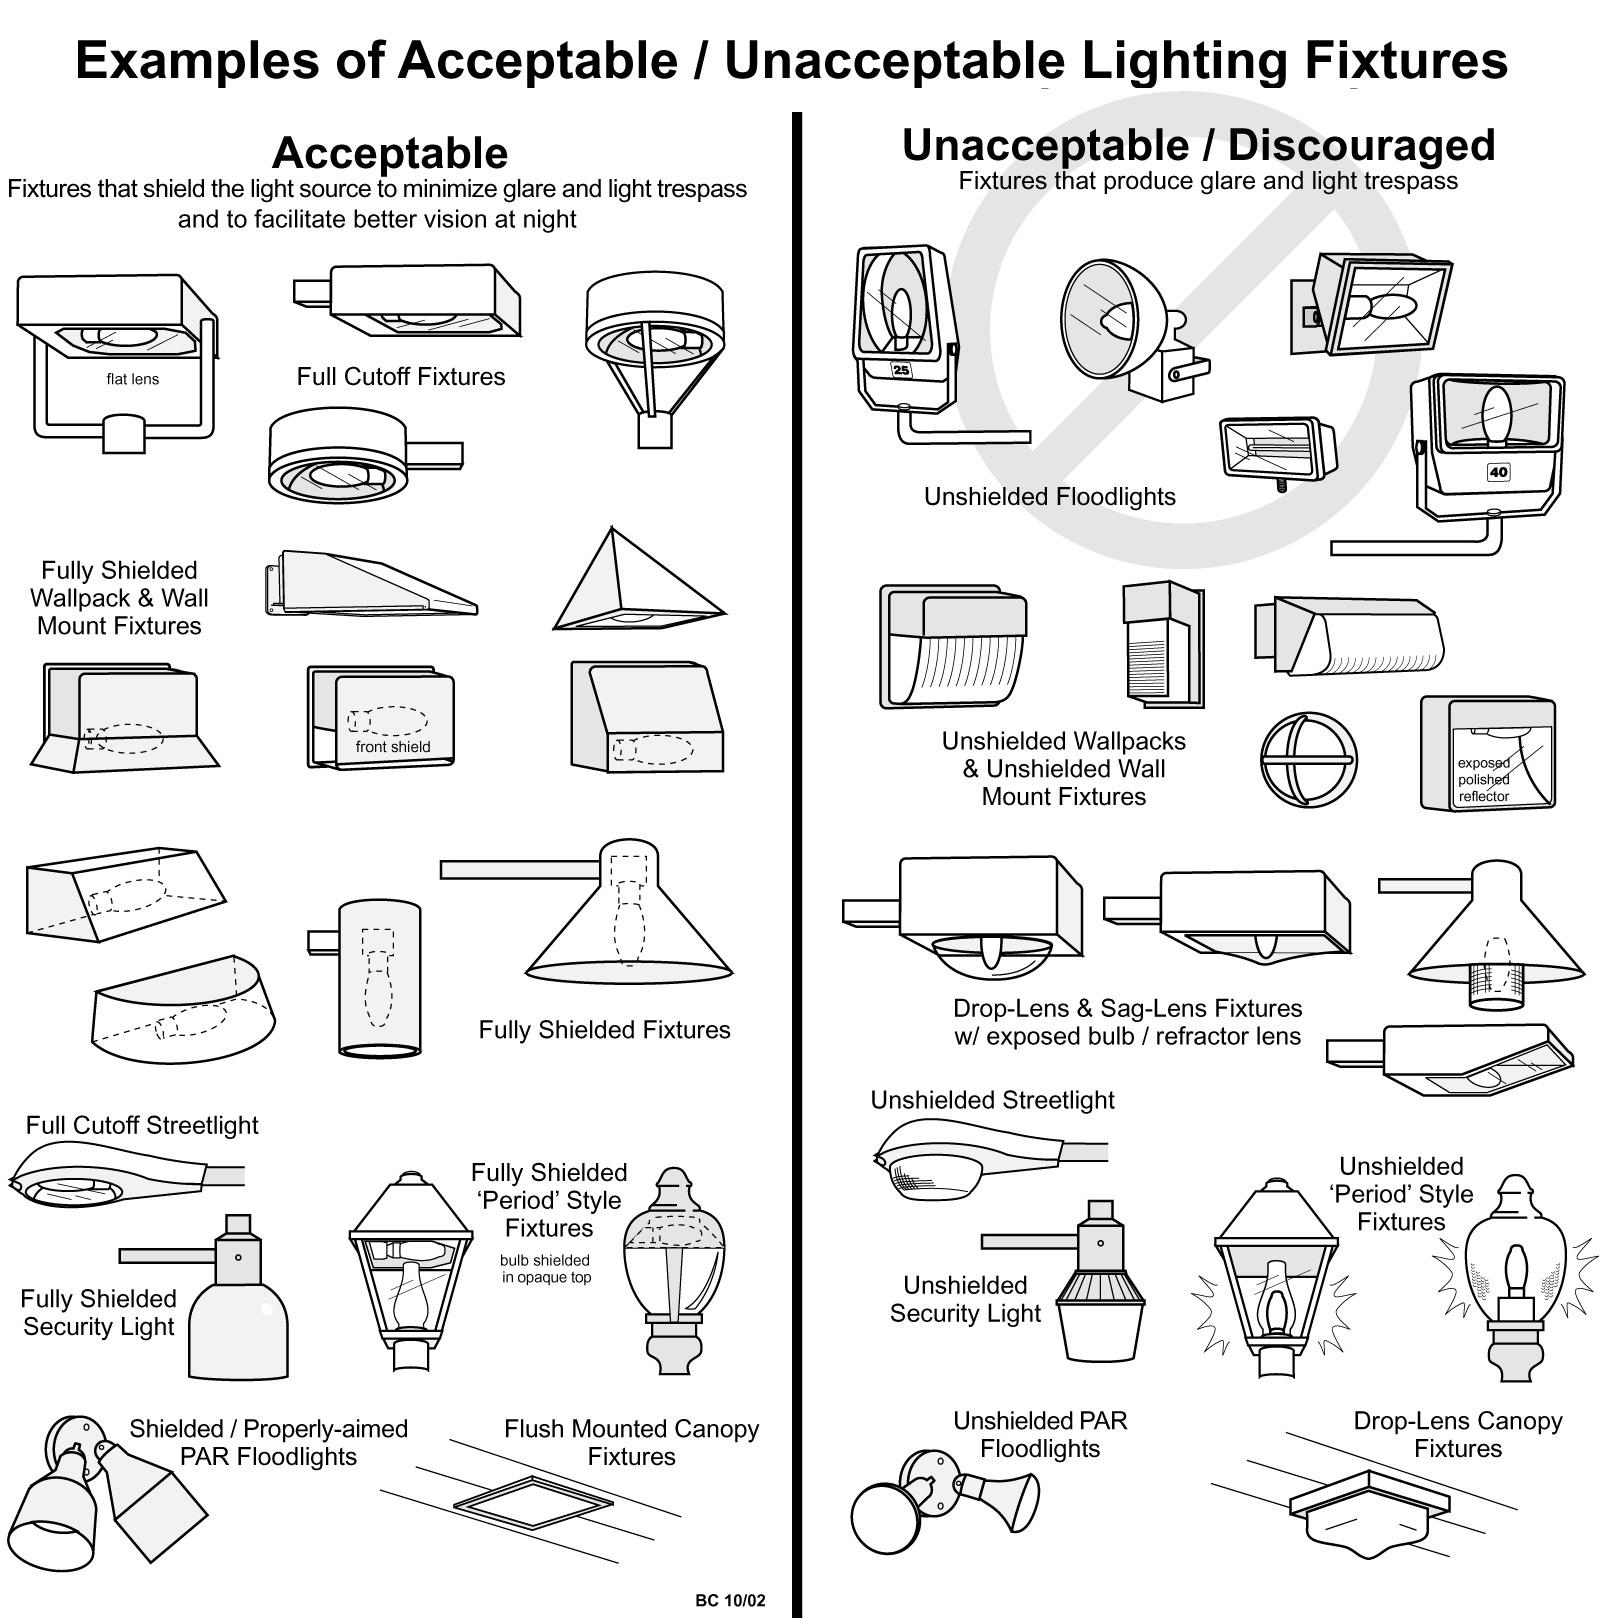 James Lowenthal: Light Pollution